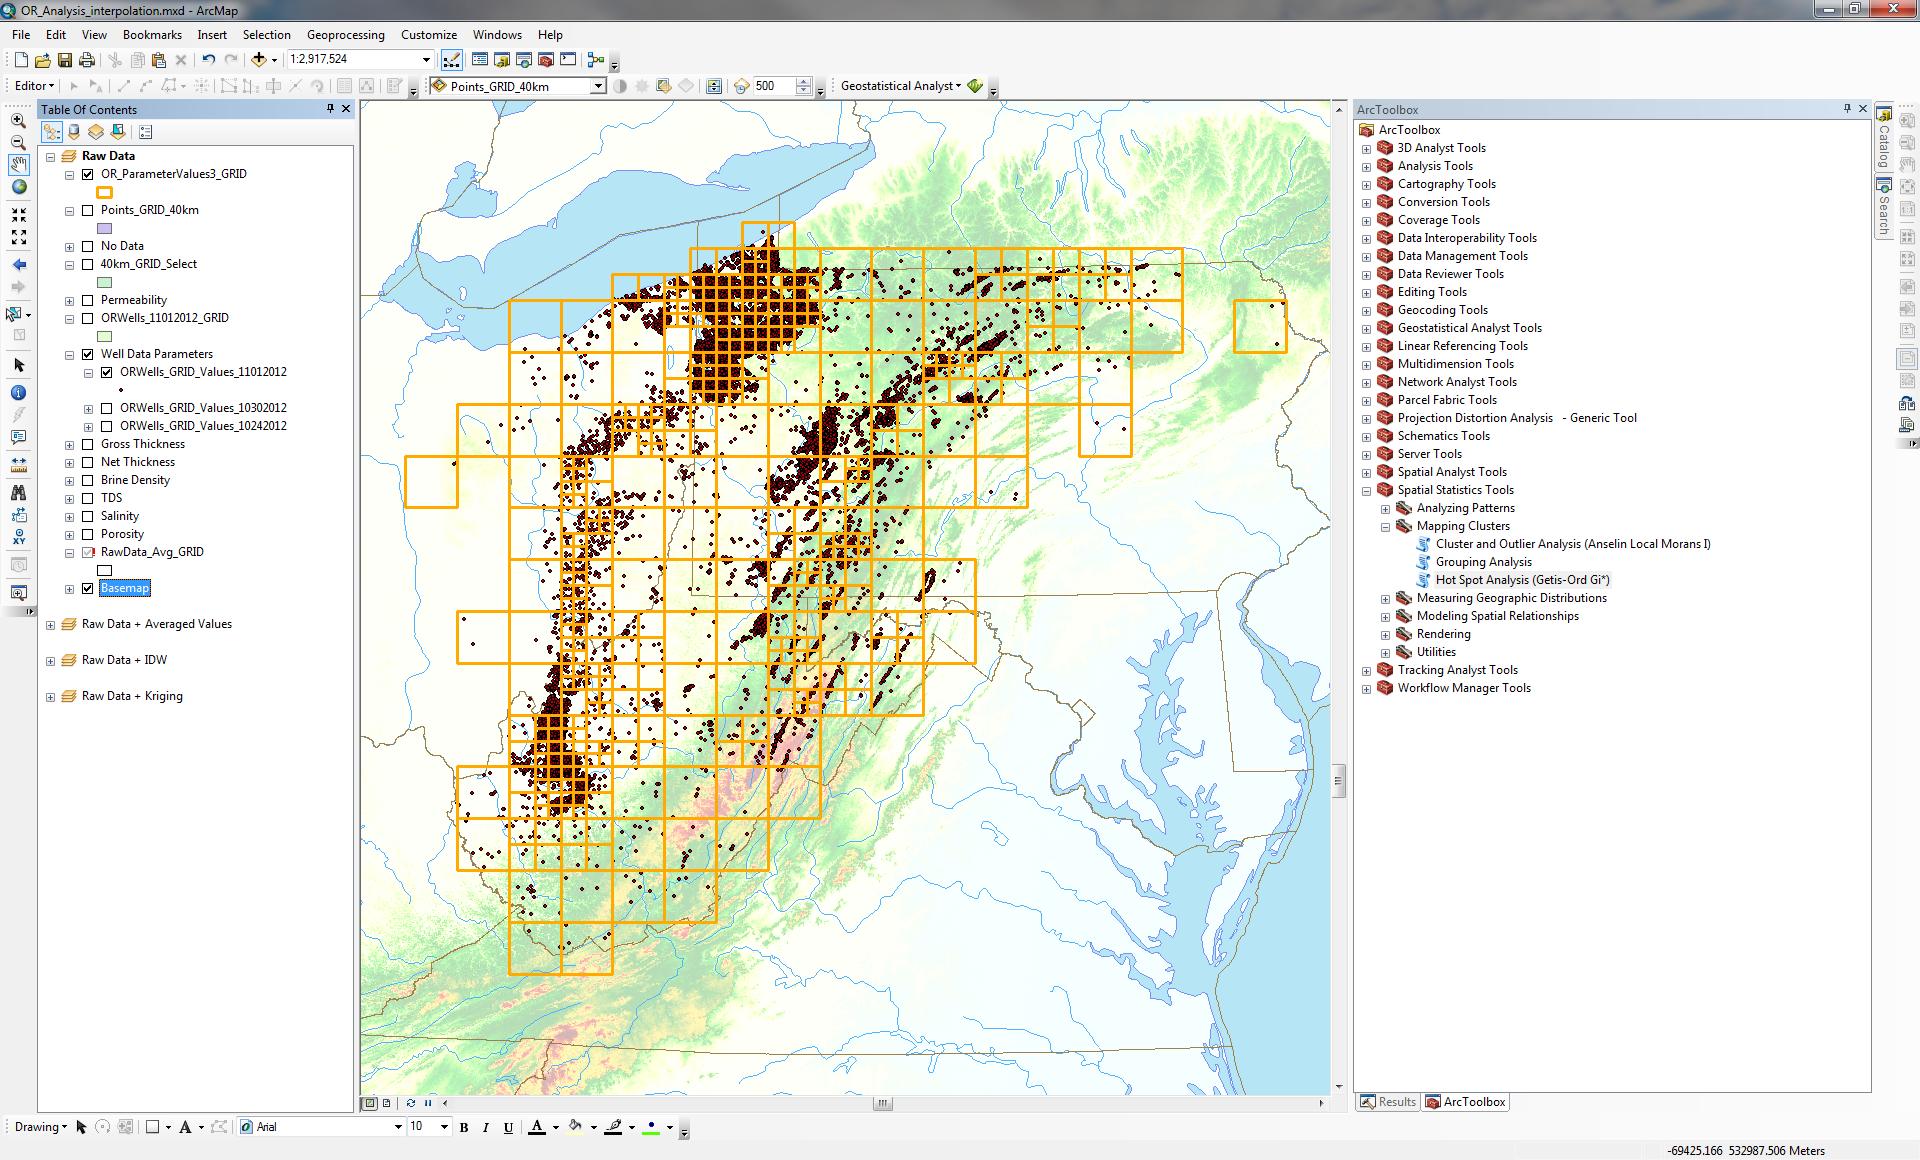 Geospatial Analysis of Natural and Engineered Data GEO 599